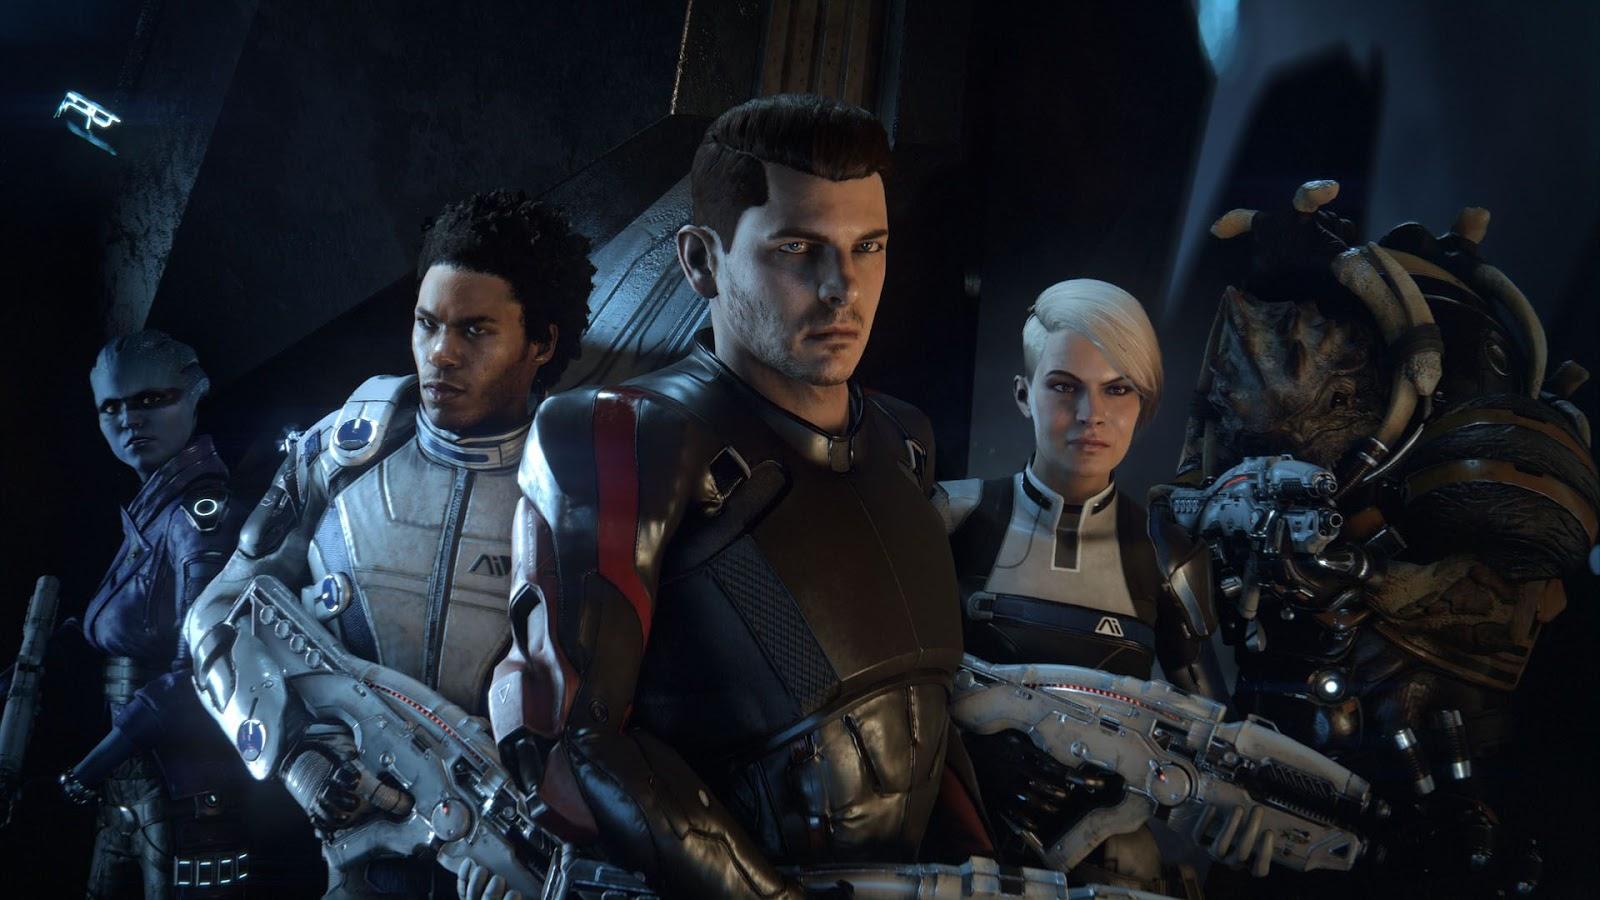 Mass Effect Andromeda ESPAÑOL PC Full + Update 1.0.0.5 + CRACKFIX (CPY) + REPACK PROPER 9 DVD5 (JPW) 4